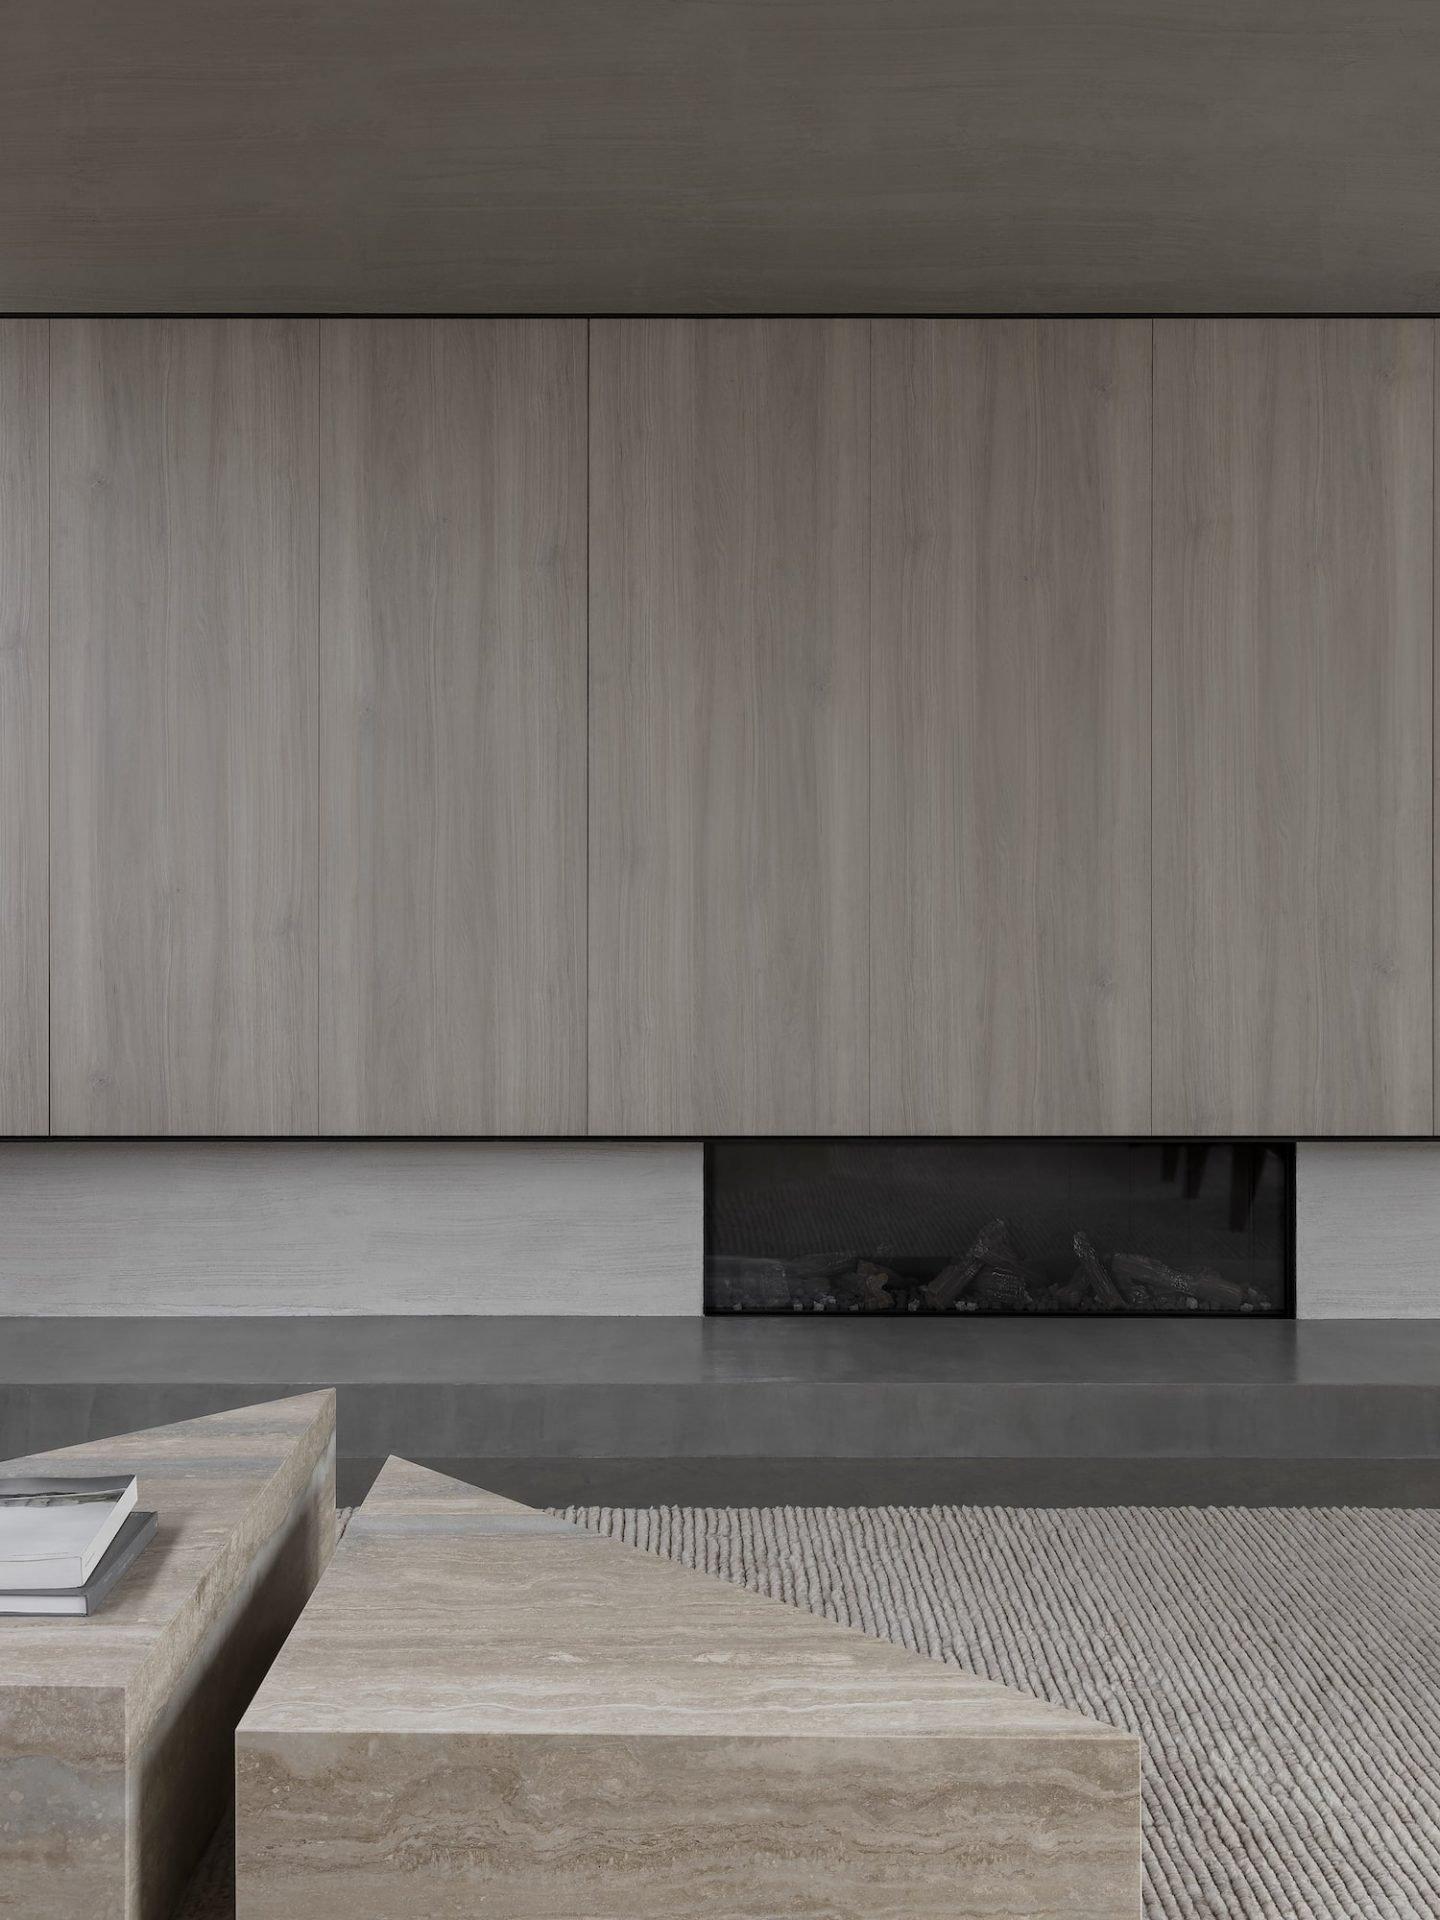 IGNANT-Architecture-Adam-Kane-Barwon-Heads-09-min